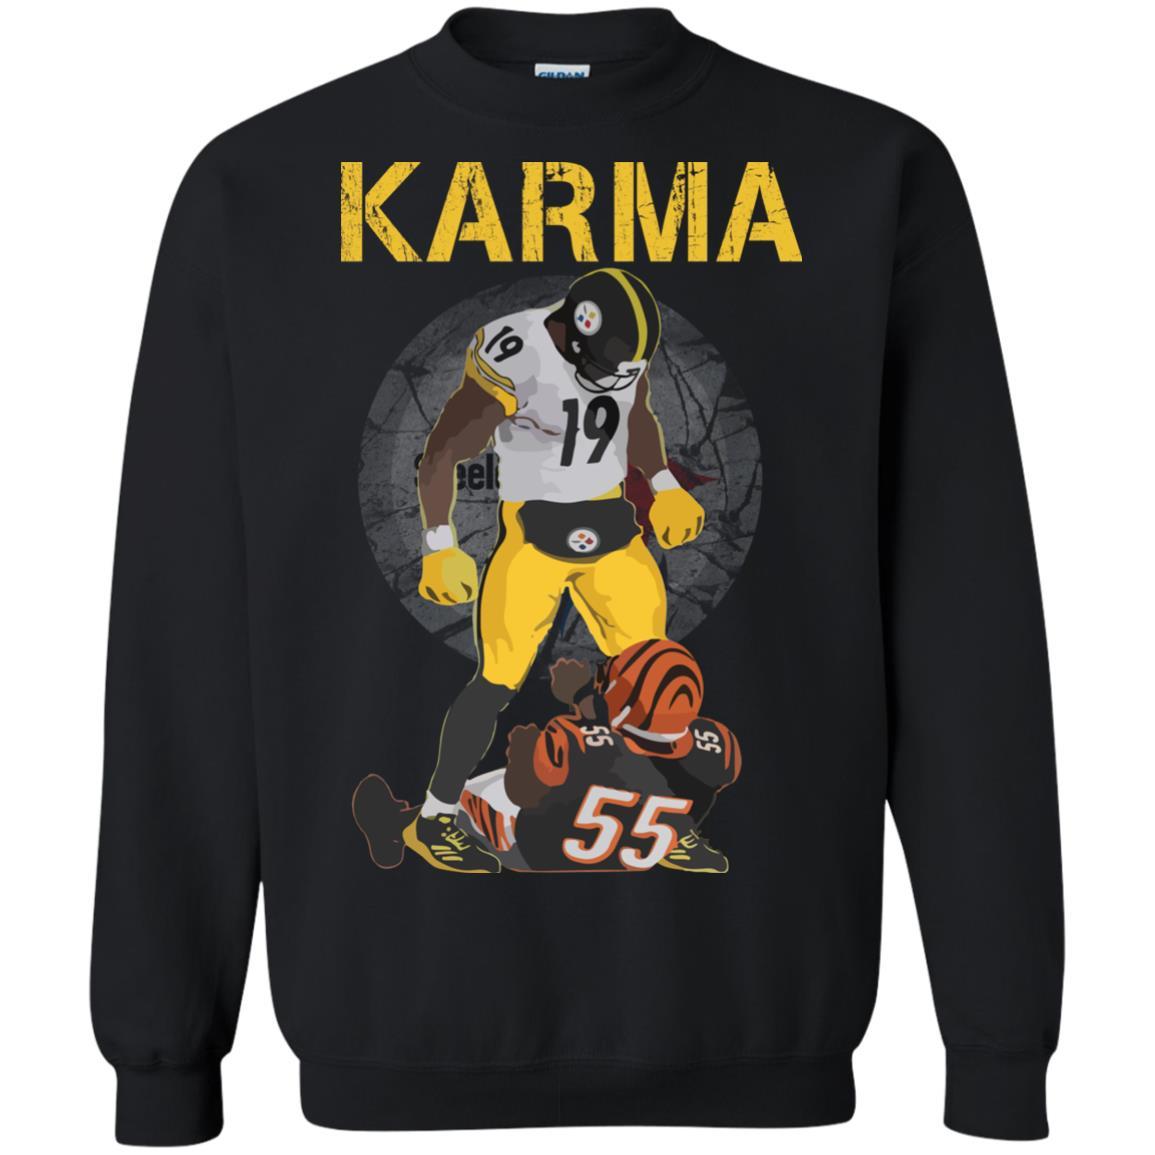 the best attitude d8e08 a5426 Juju Smith-Schuster Karma Vontaze Burfict Shirt, Sweatshirts